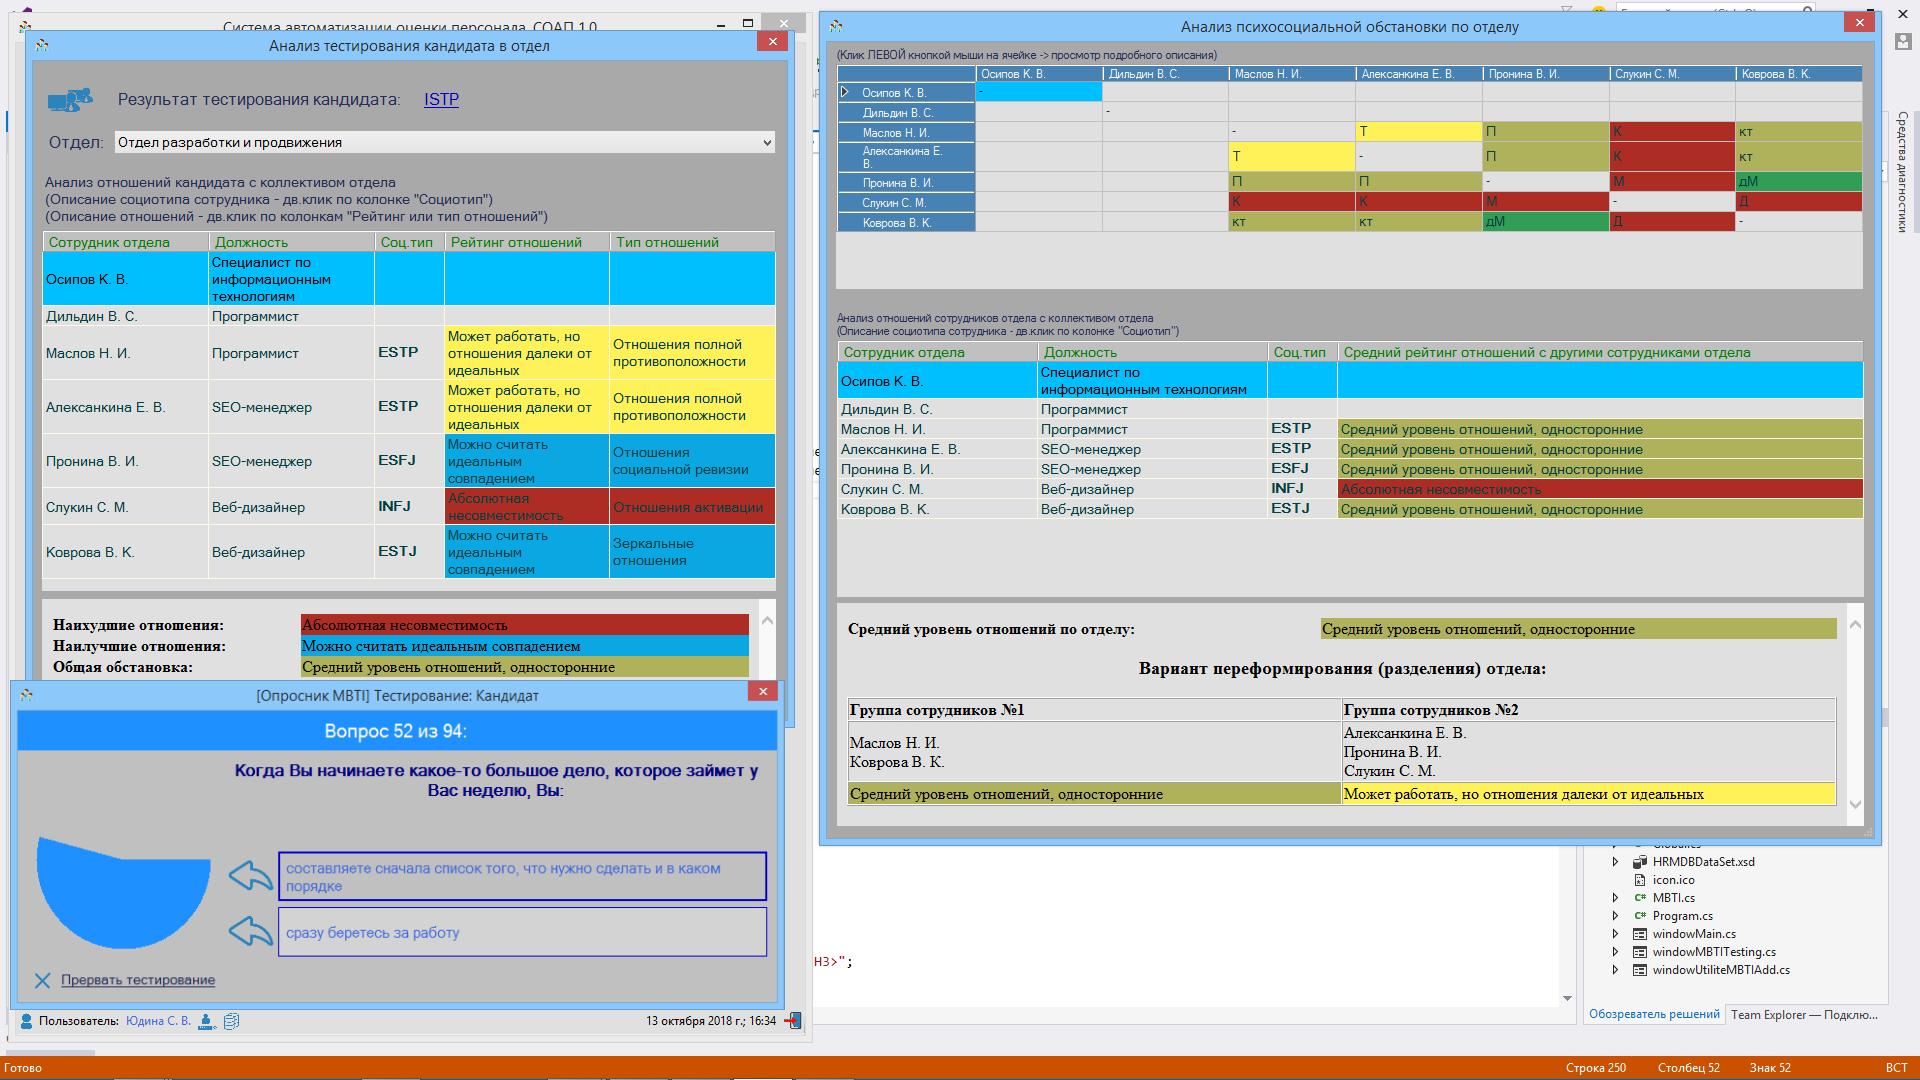 Система автоматизации оценки персонала